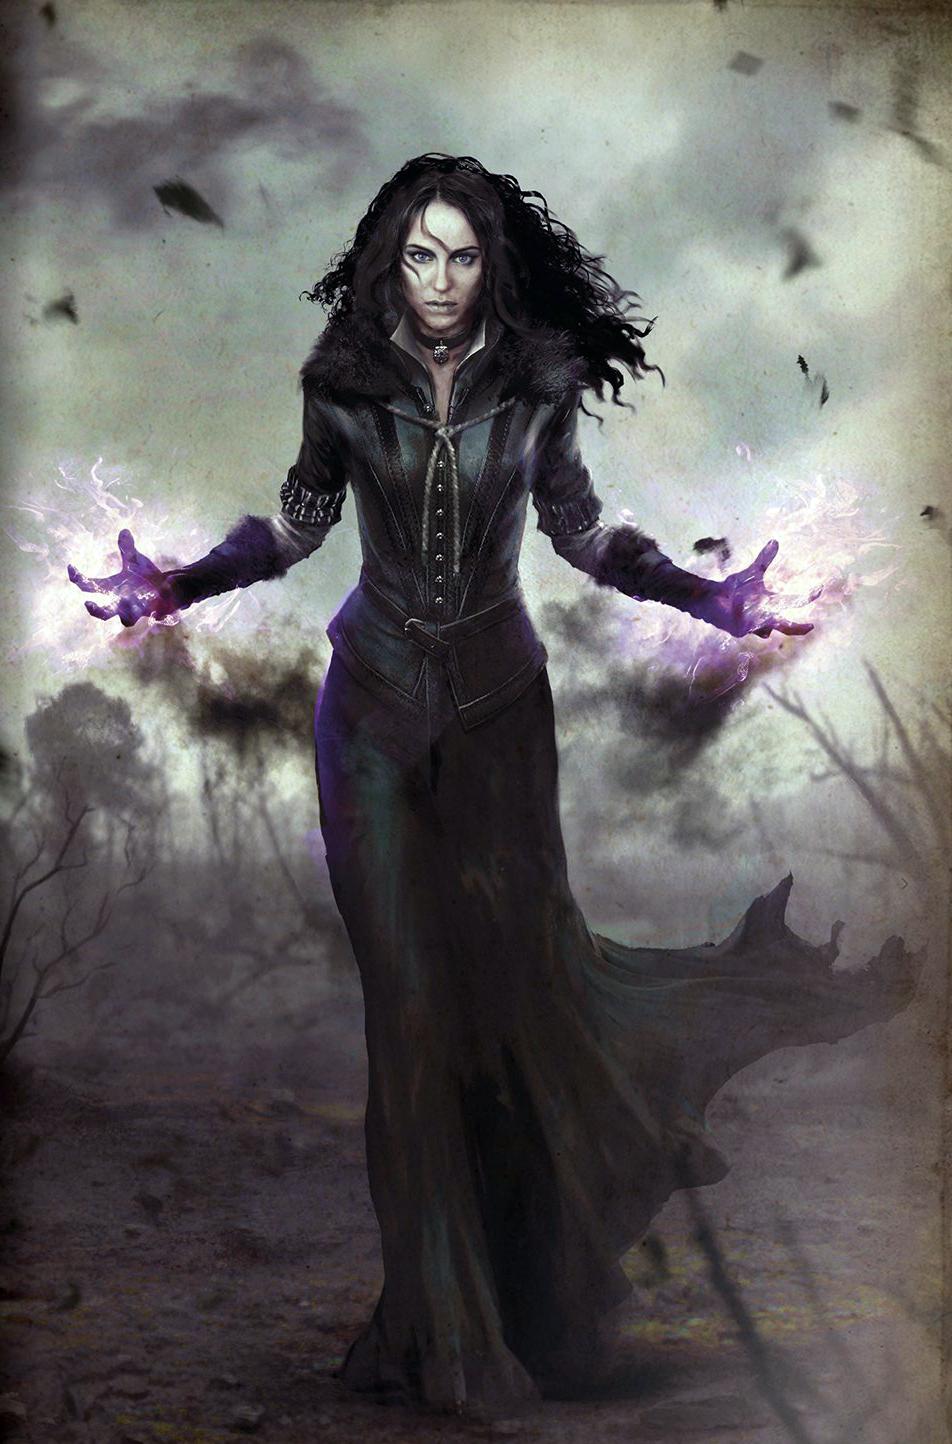 Yennefer Of Vengerberg The Witcher Image 2177608 Zerochan Anime Image Board